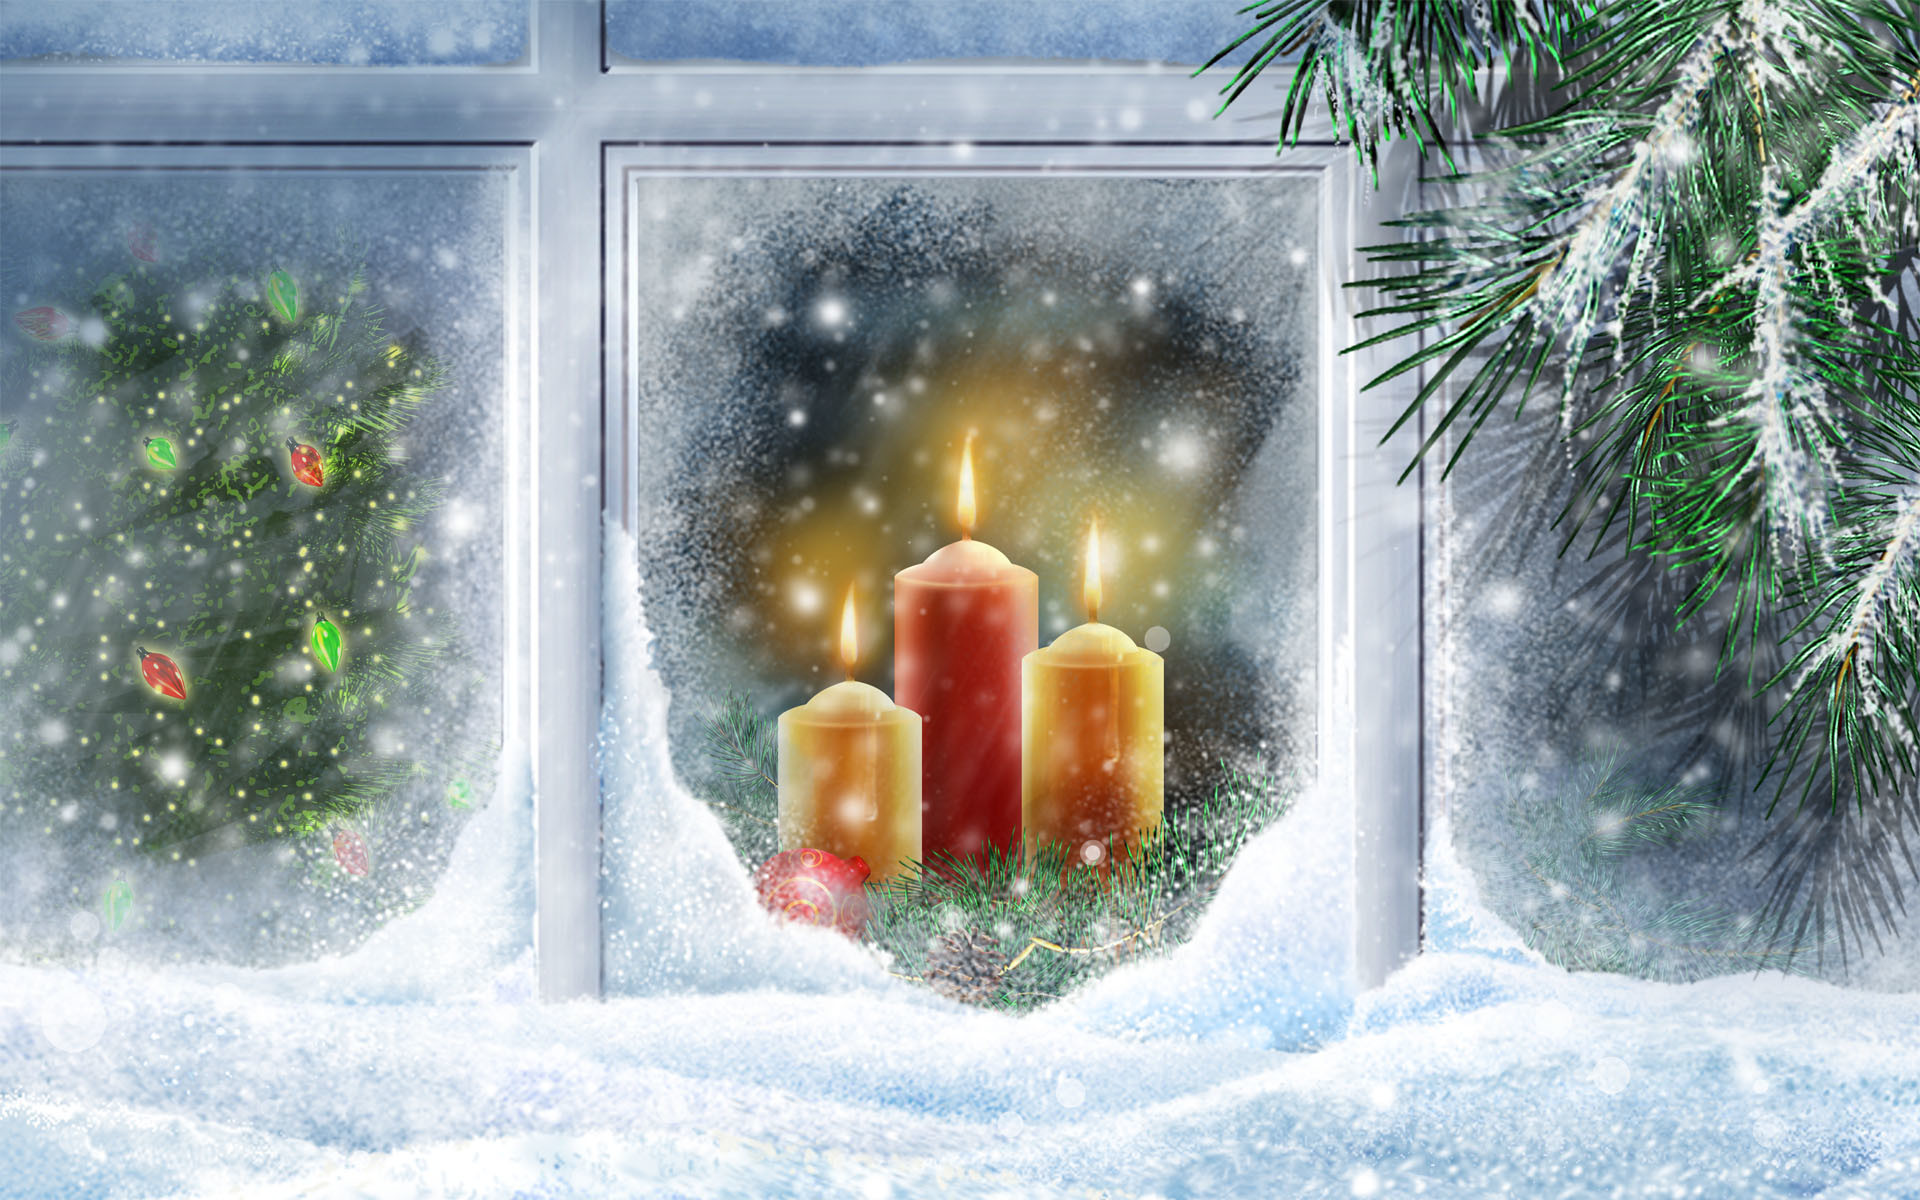 Christmas Wallpapers, Xmas HD Desktop Backgrounds, Widescreen .